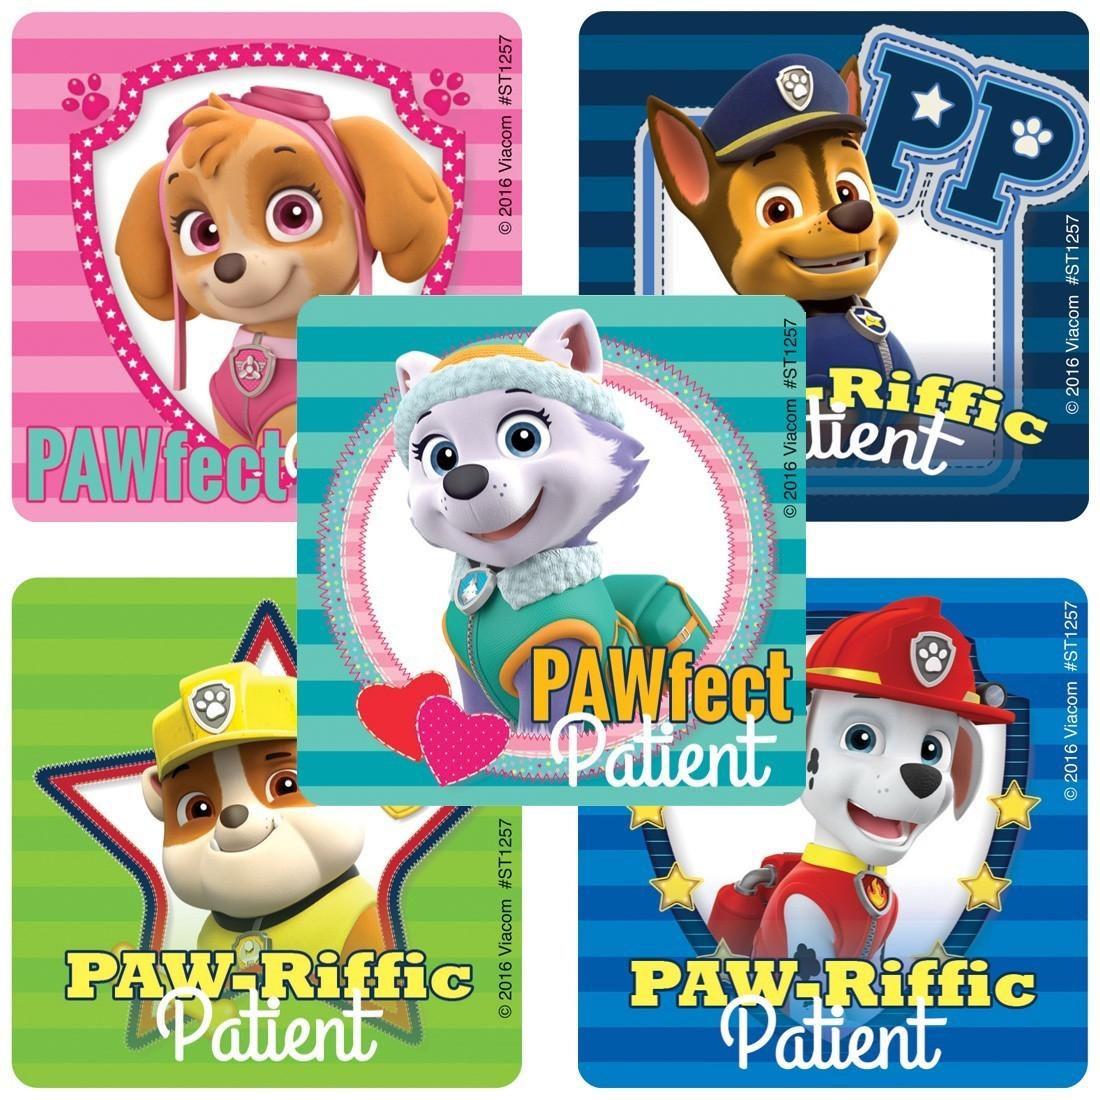 PAW Patrol Patient Stickers  [image]